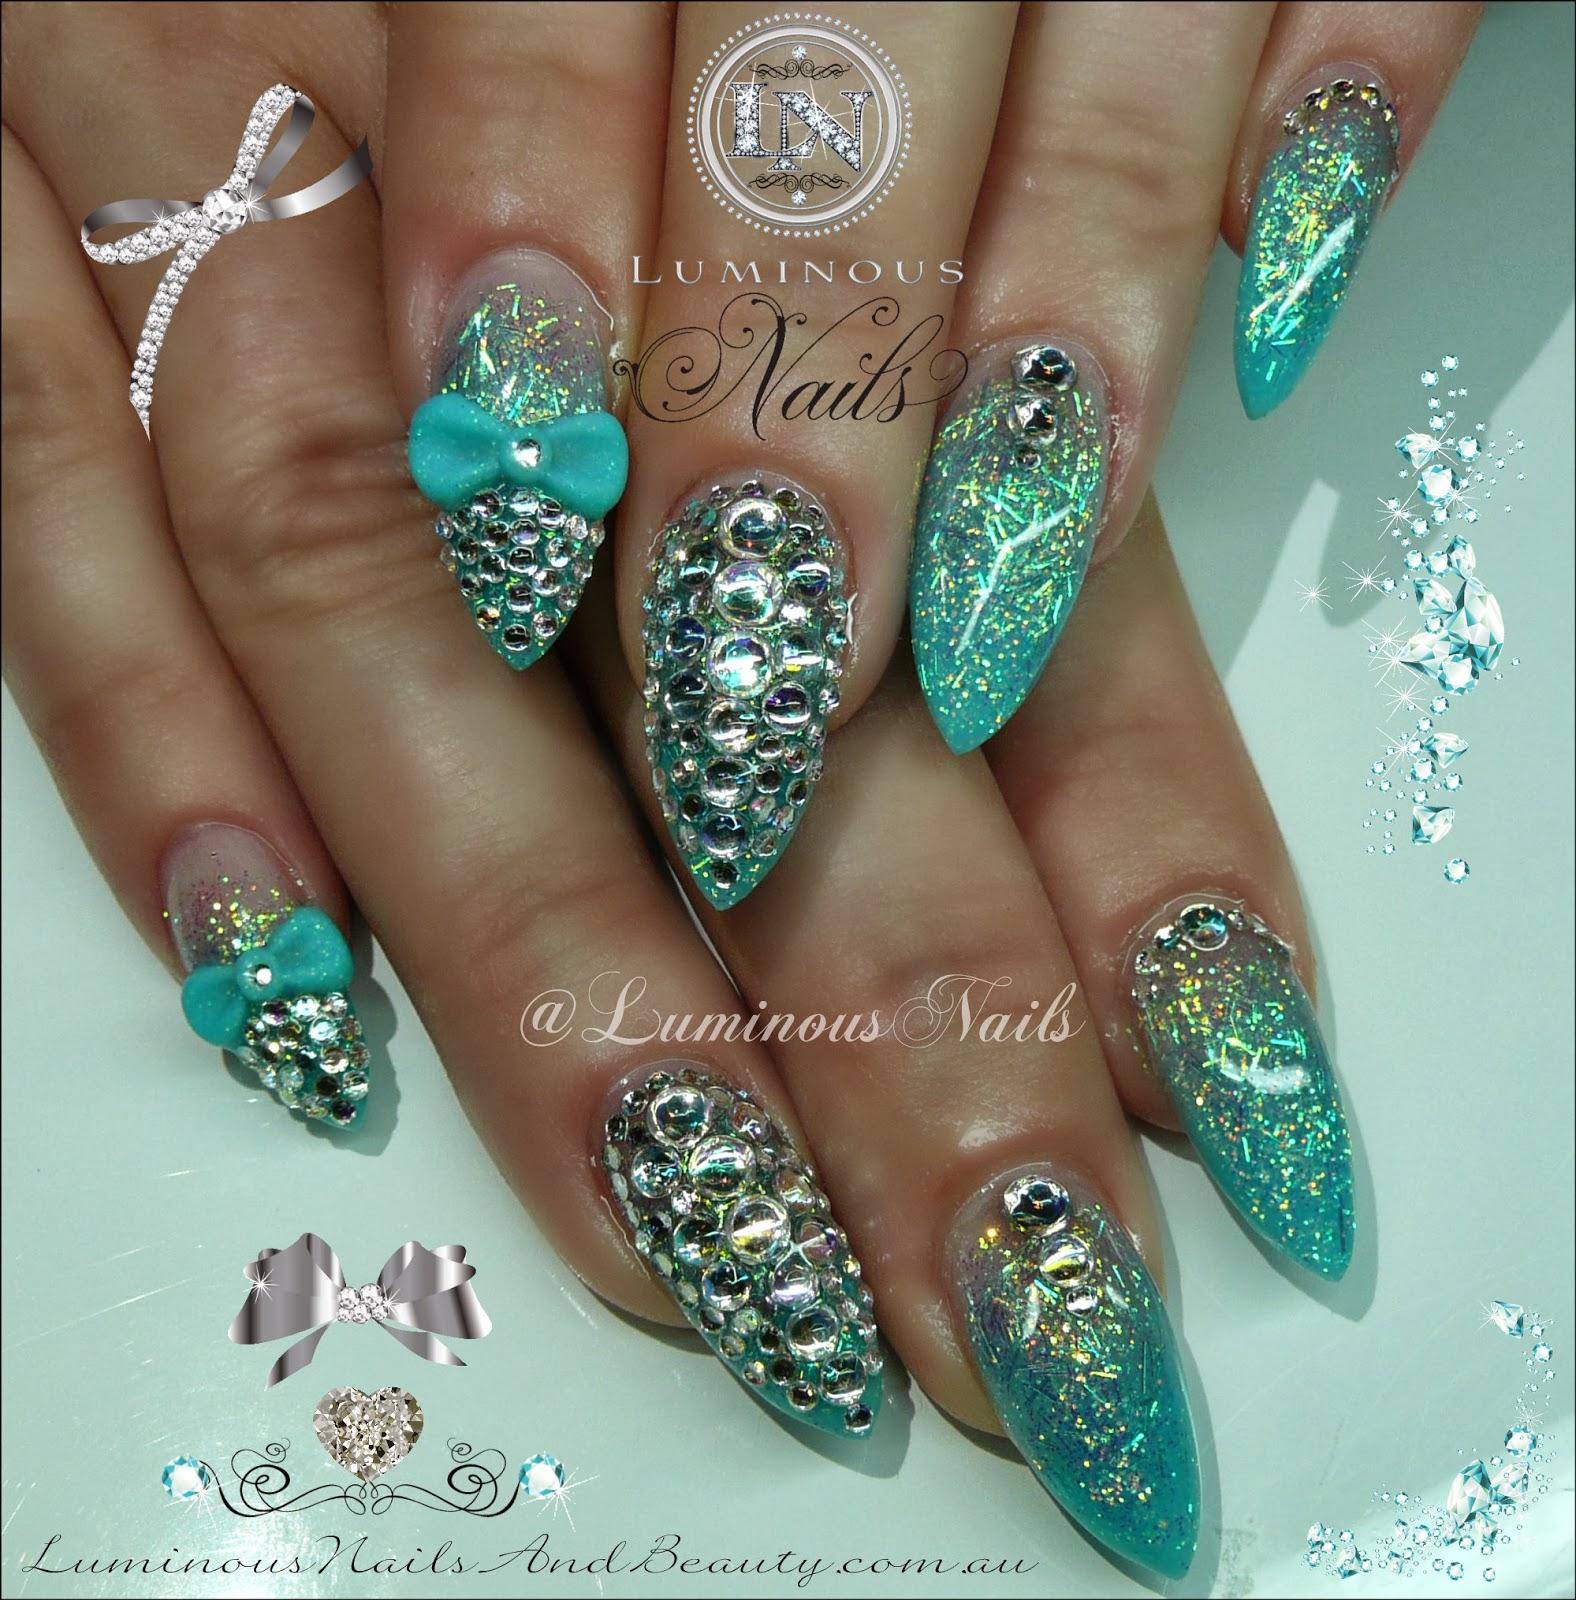 Luminous Nails: March 2014